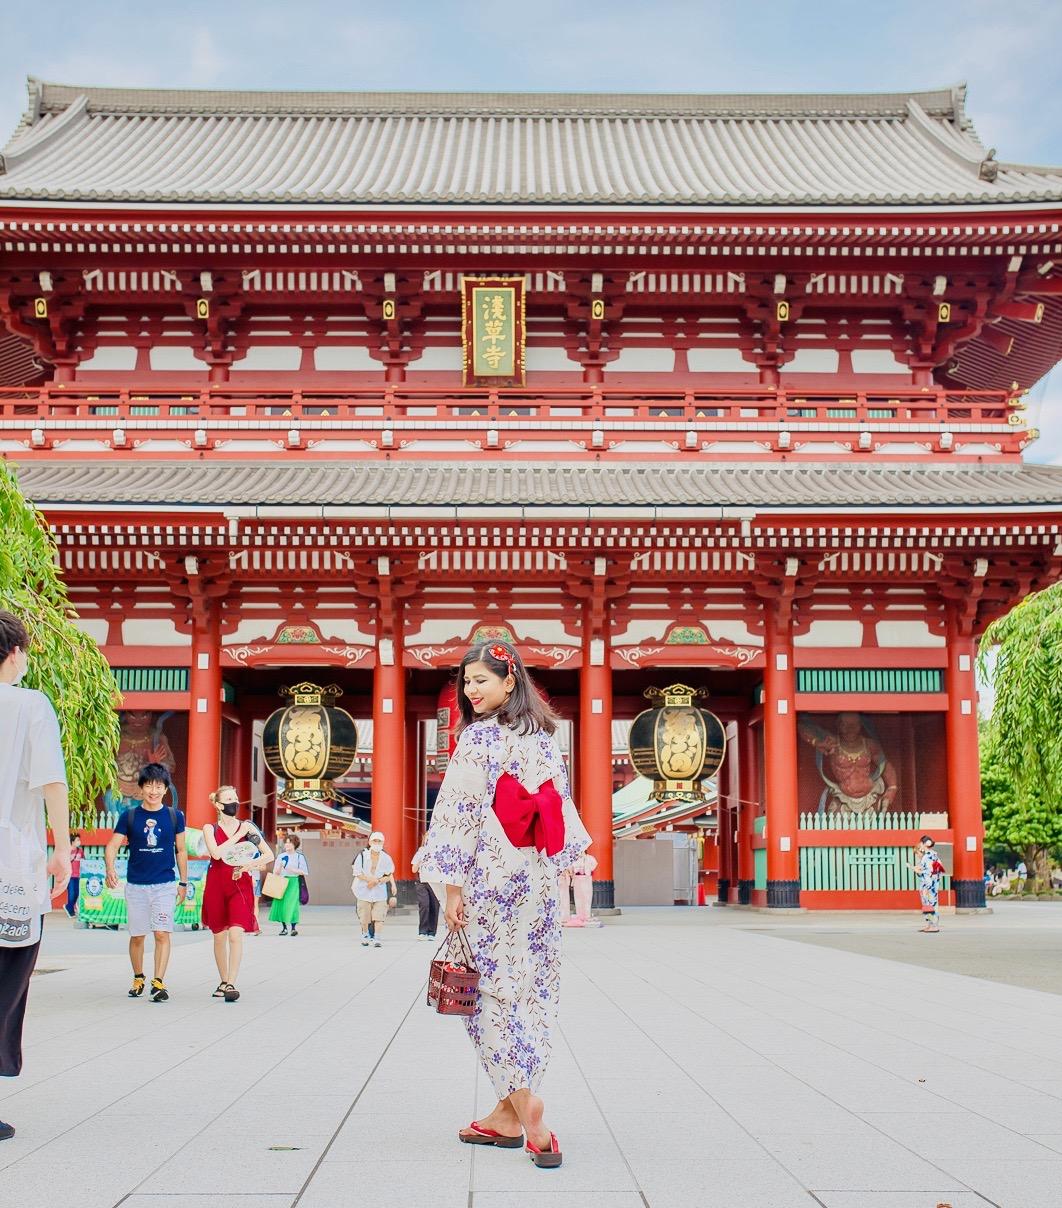 Senso-ji 浅草寺